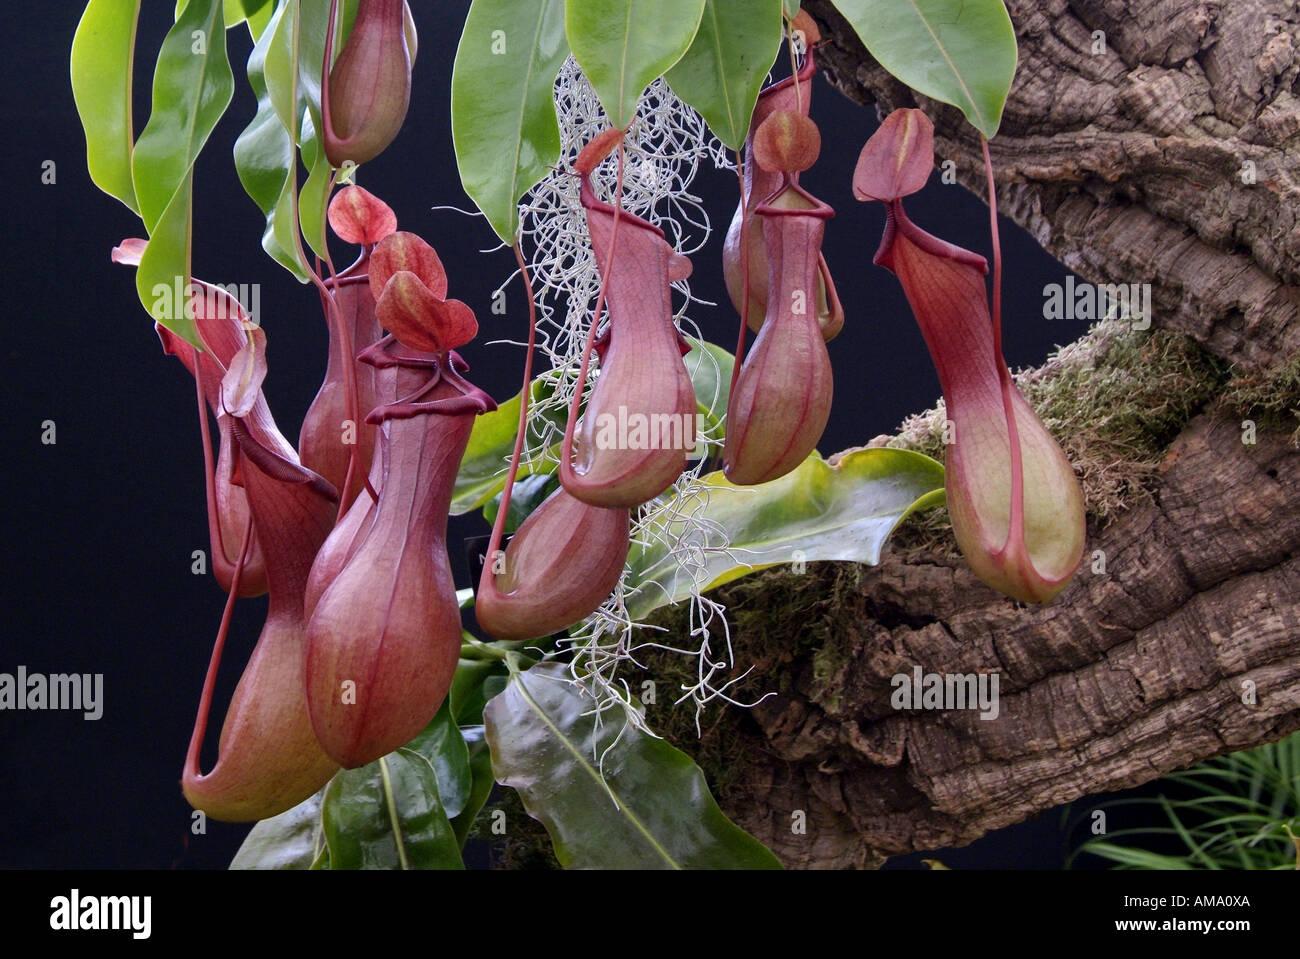 Sarracenia purpurea sarracénie Amérique du americaTropical insectes fleurs manger insectivores carnivores carnivores exotiques Banque D'Images